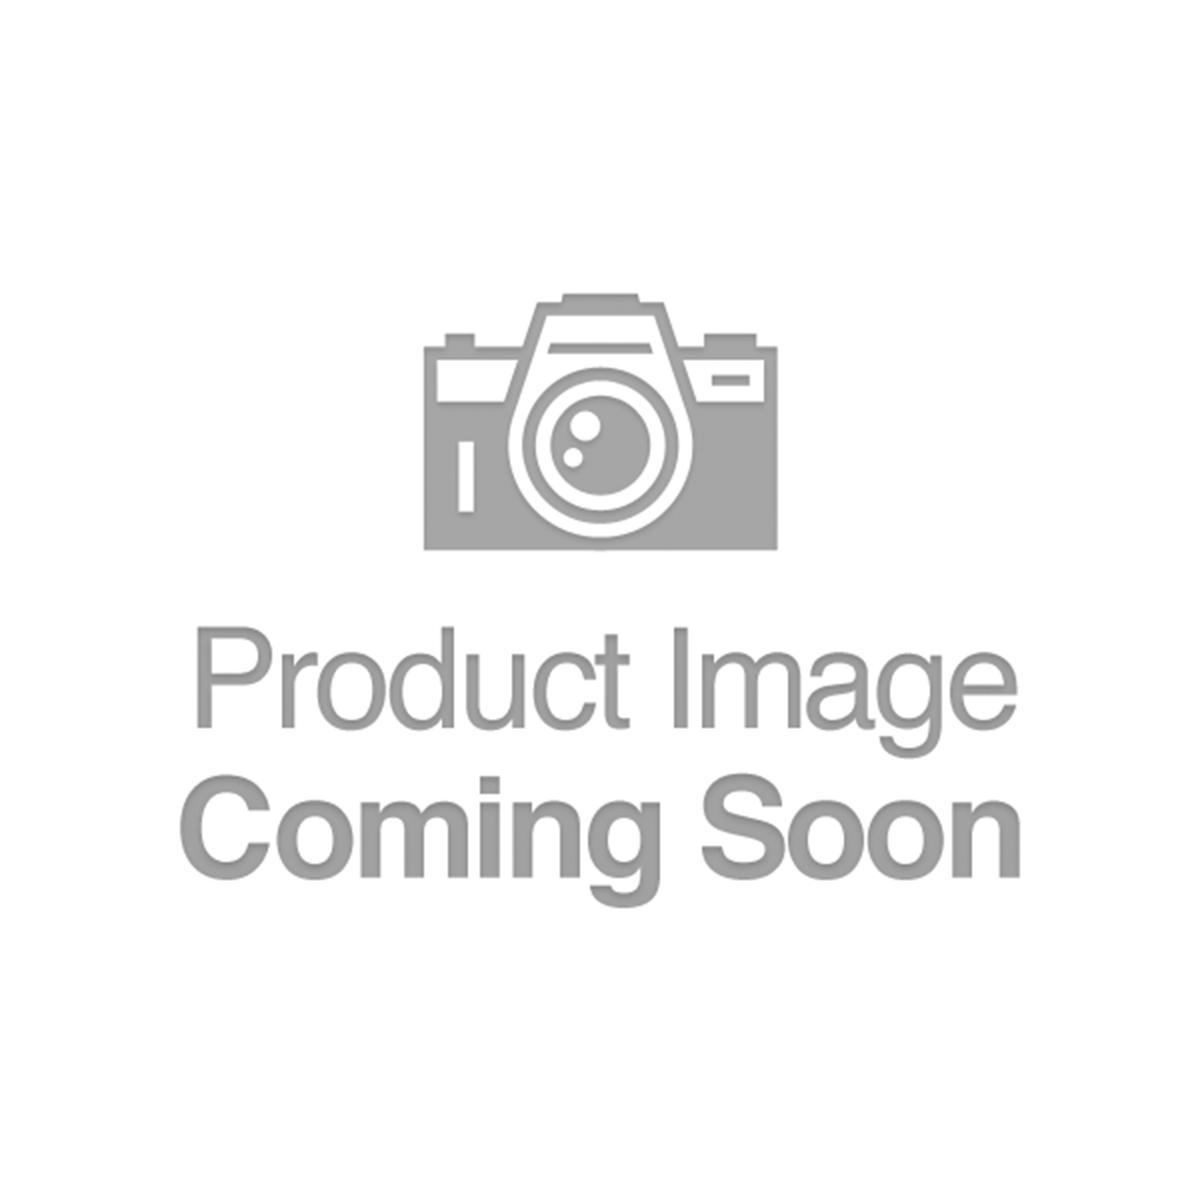 FR. 1214 $100 1882 Gold Certificate PMG 66 EPQ